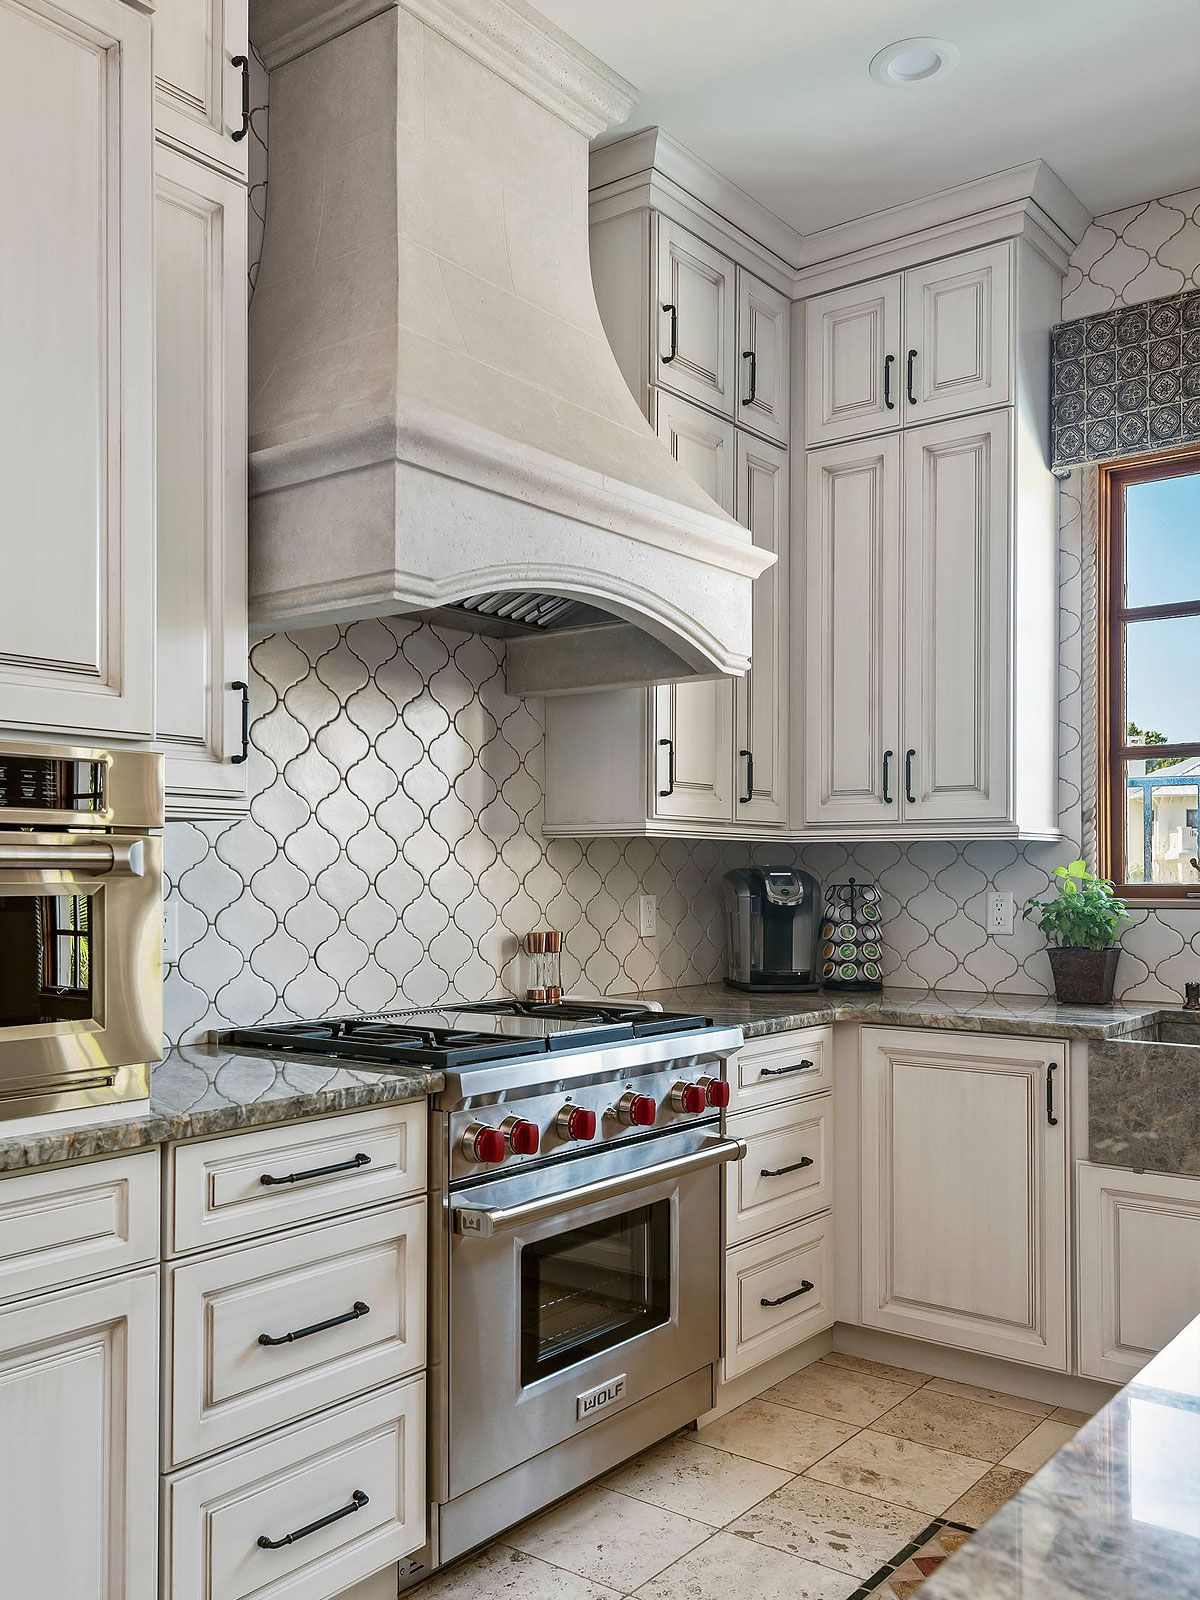 White Glazed Porcelain Arabesque Backsplash Tile Backsplash Com White Kitchen Rustic Kitchen Backsplash Trends Kitchen Design